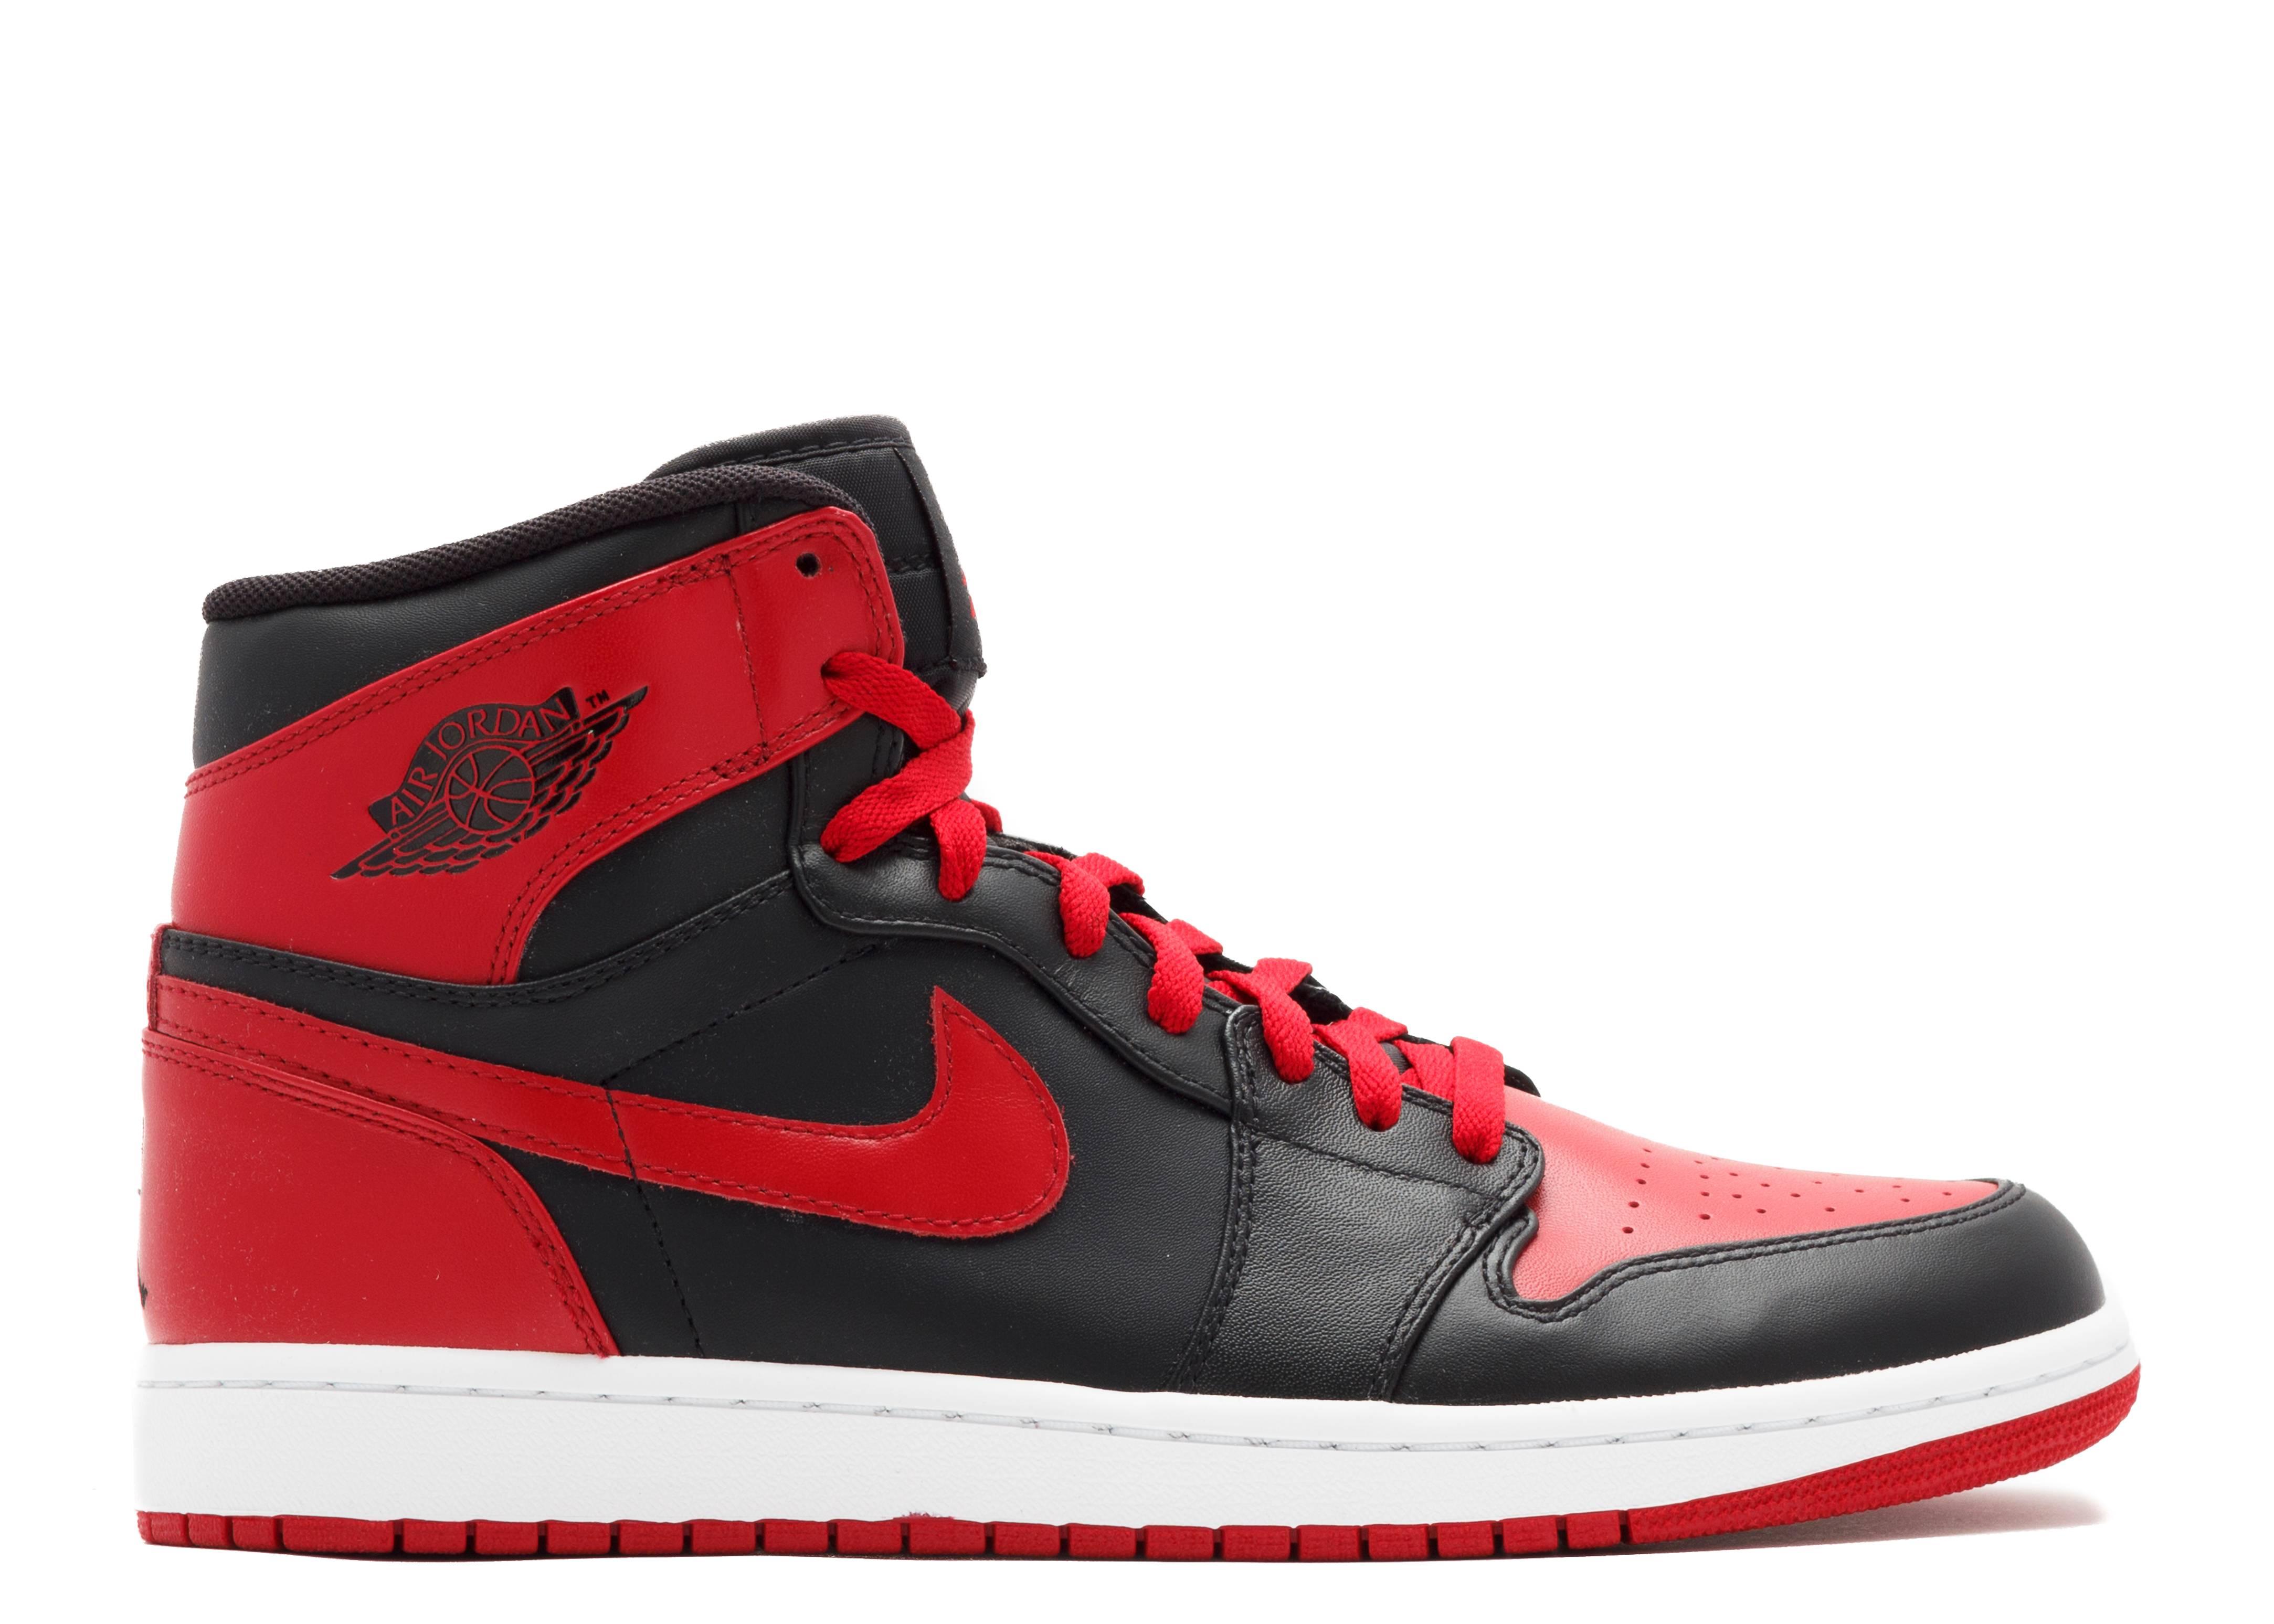 selva grano Grande  Air Jordan 1 High Retro DMP 'Chicago Bulls' - Air Jordan - 332550 061 -  black/varsity red | Flight Club